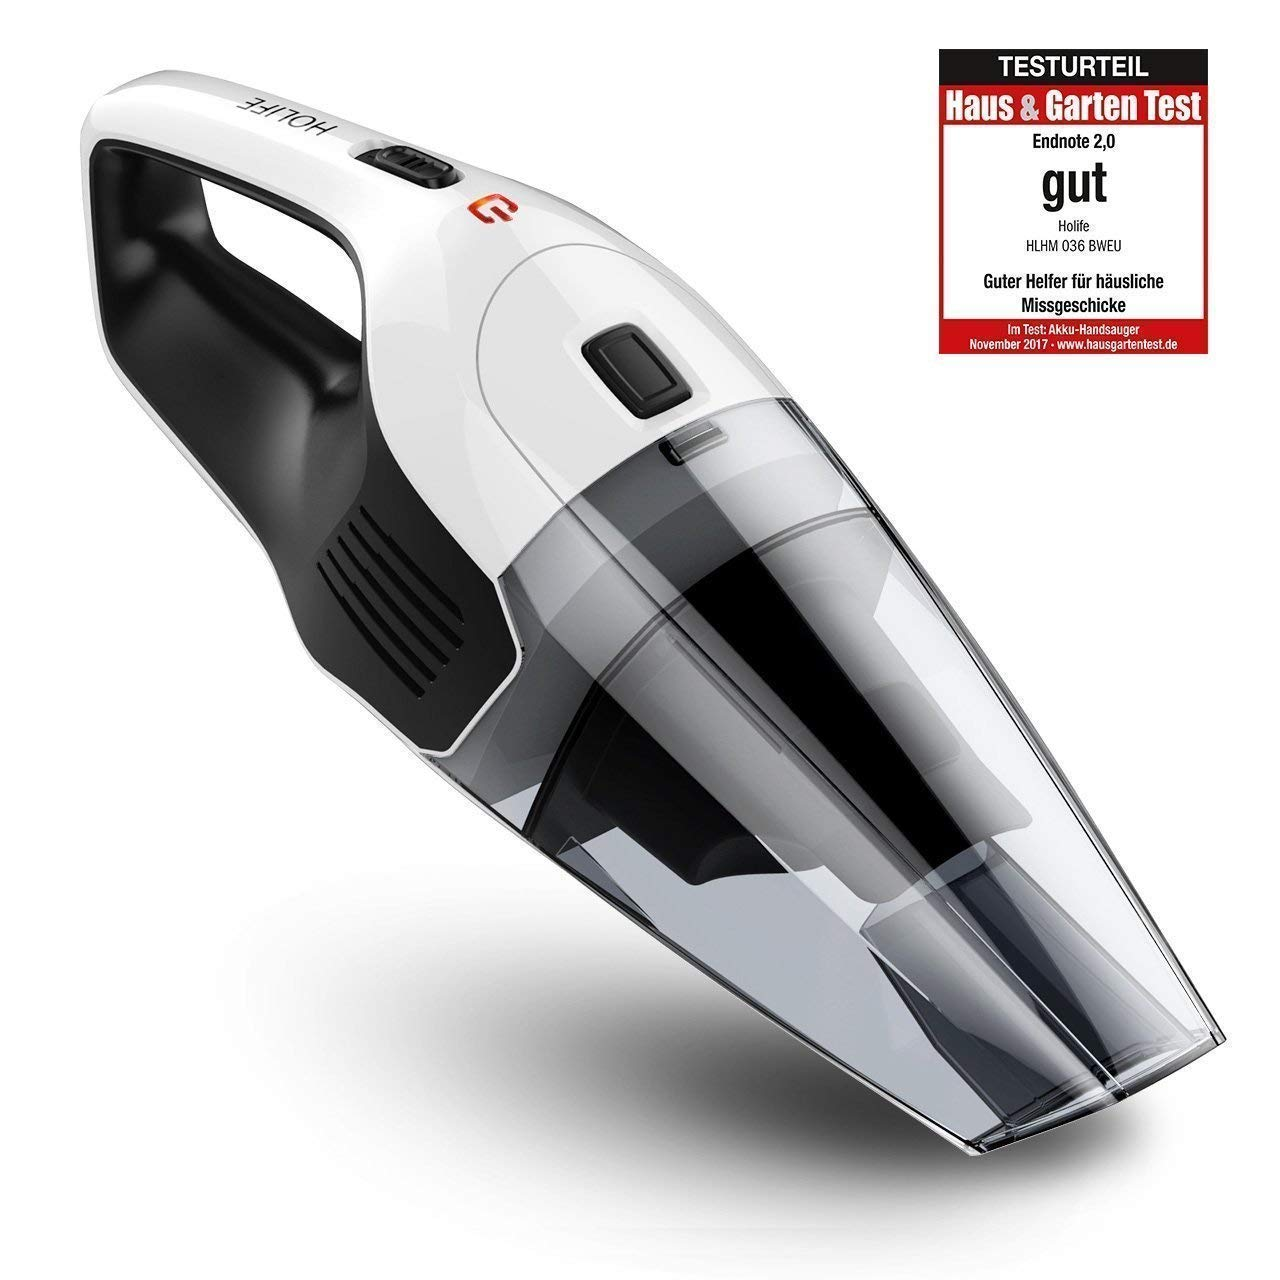 holife mano inalámbrico aspiradora, holife batería coche de mano inalámbrico Vac: Amazon.es: Hogar